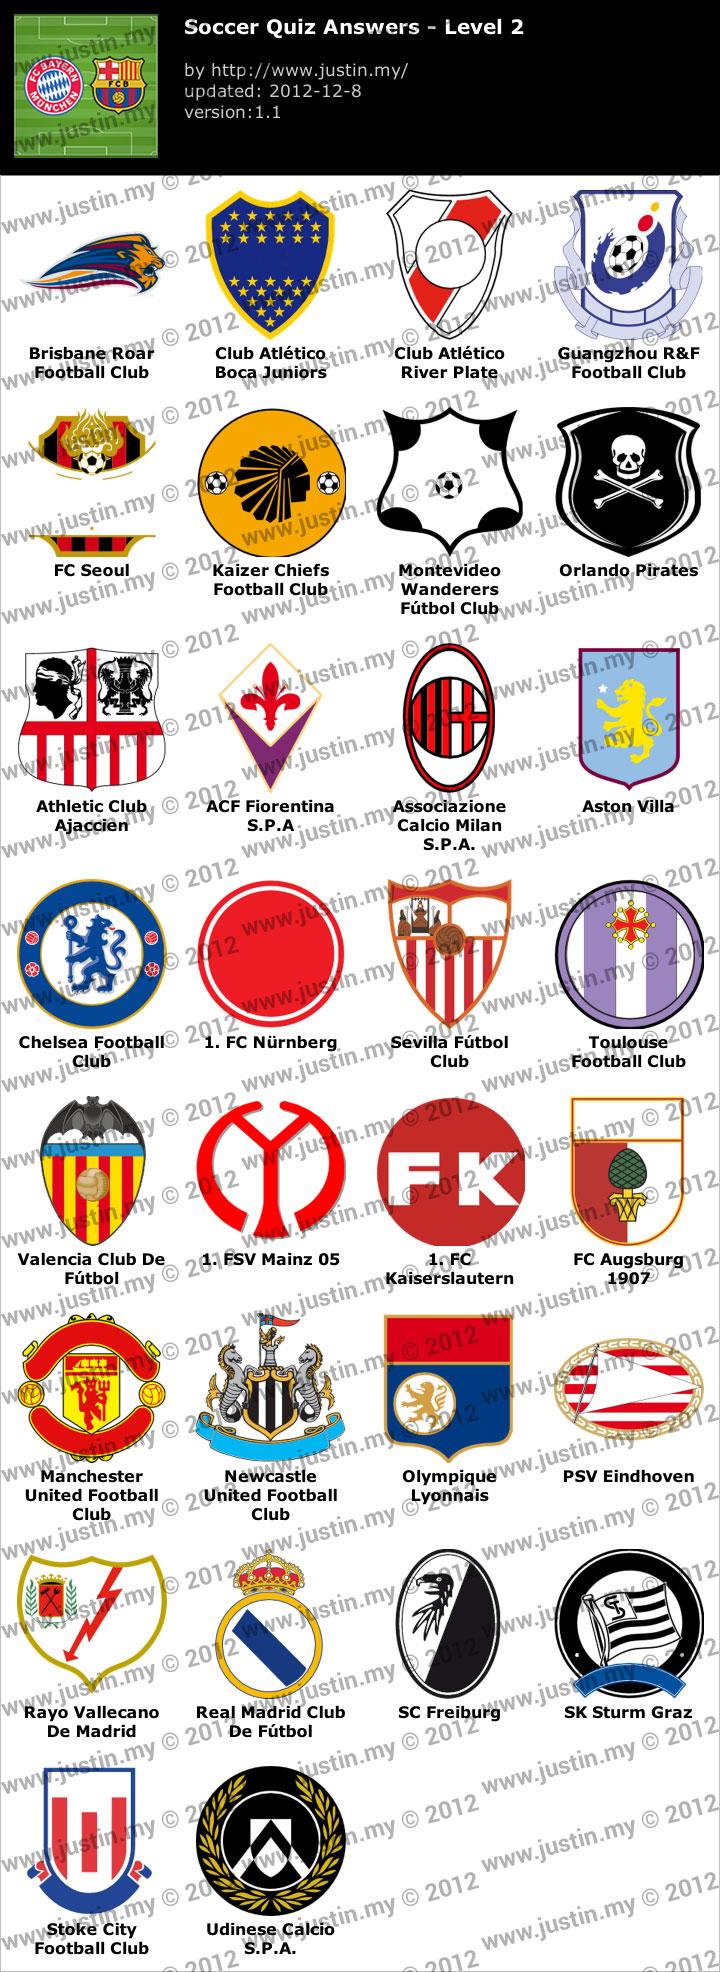 Soccer Quiz Level 2